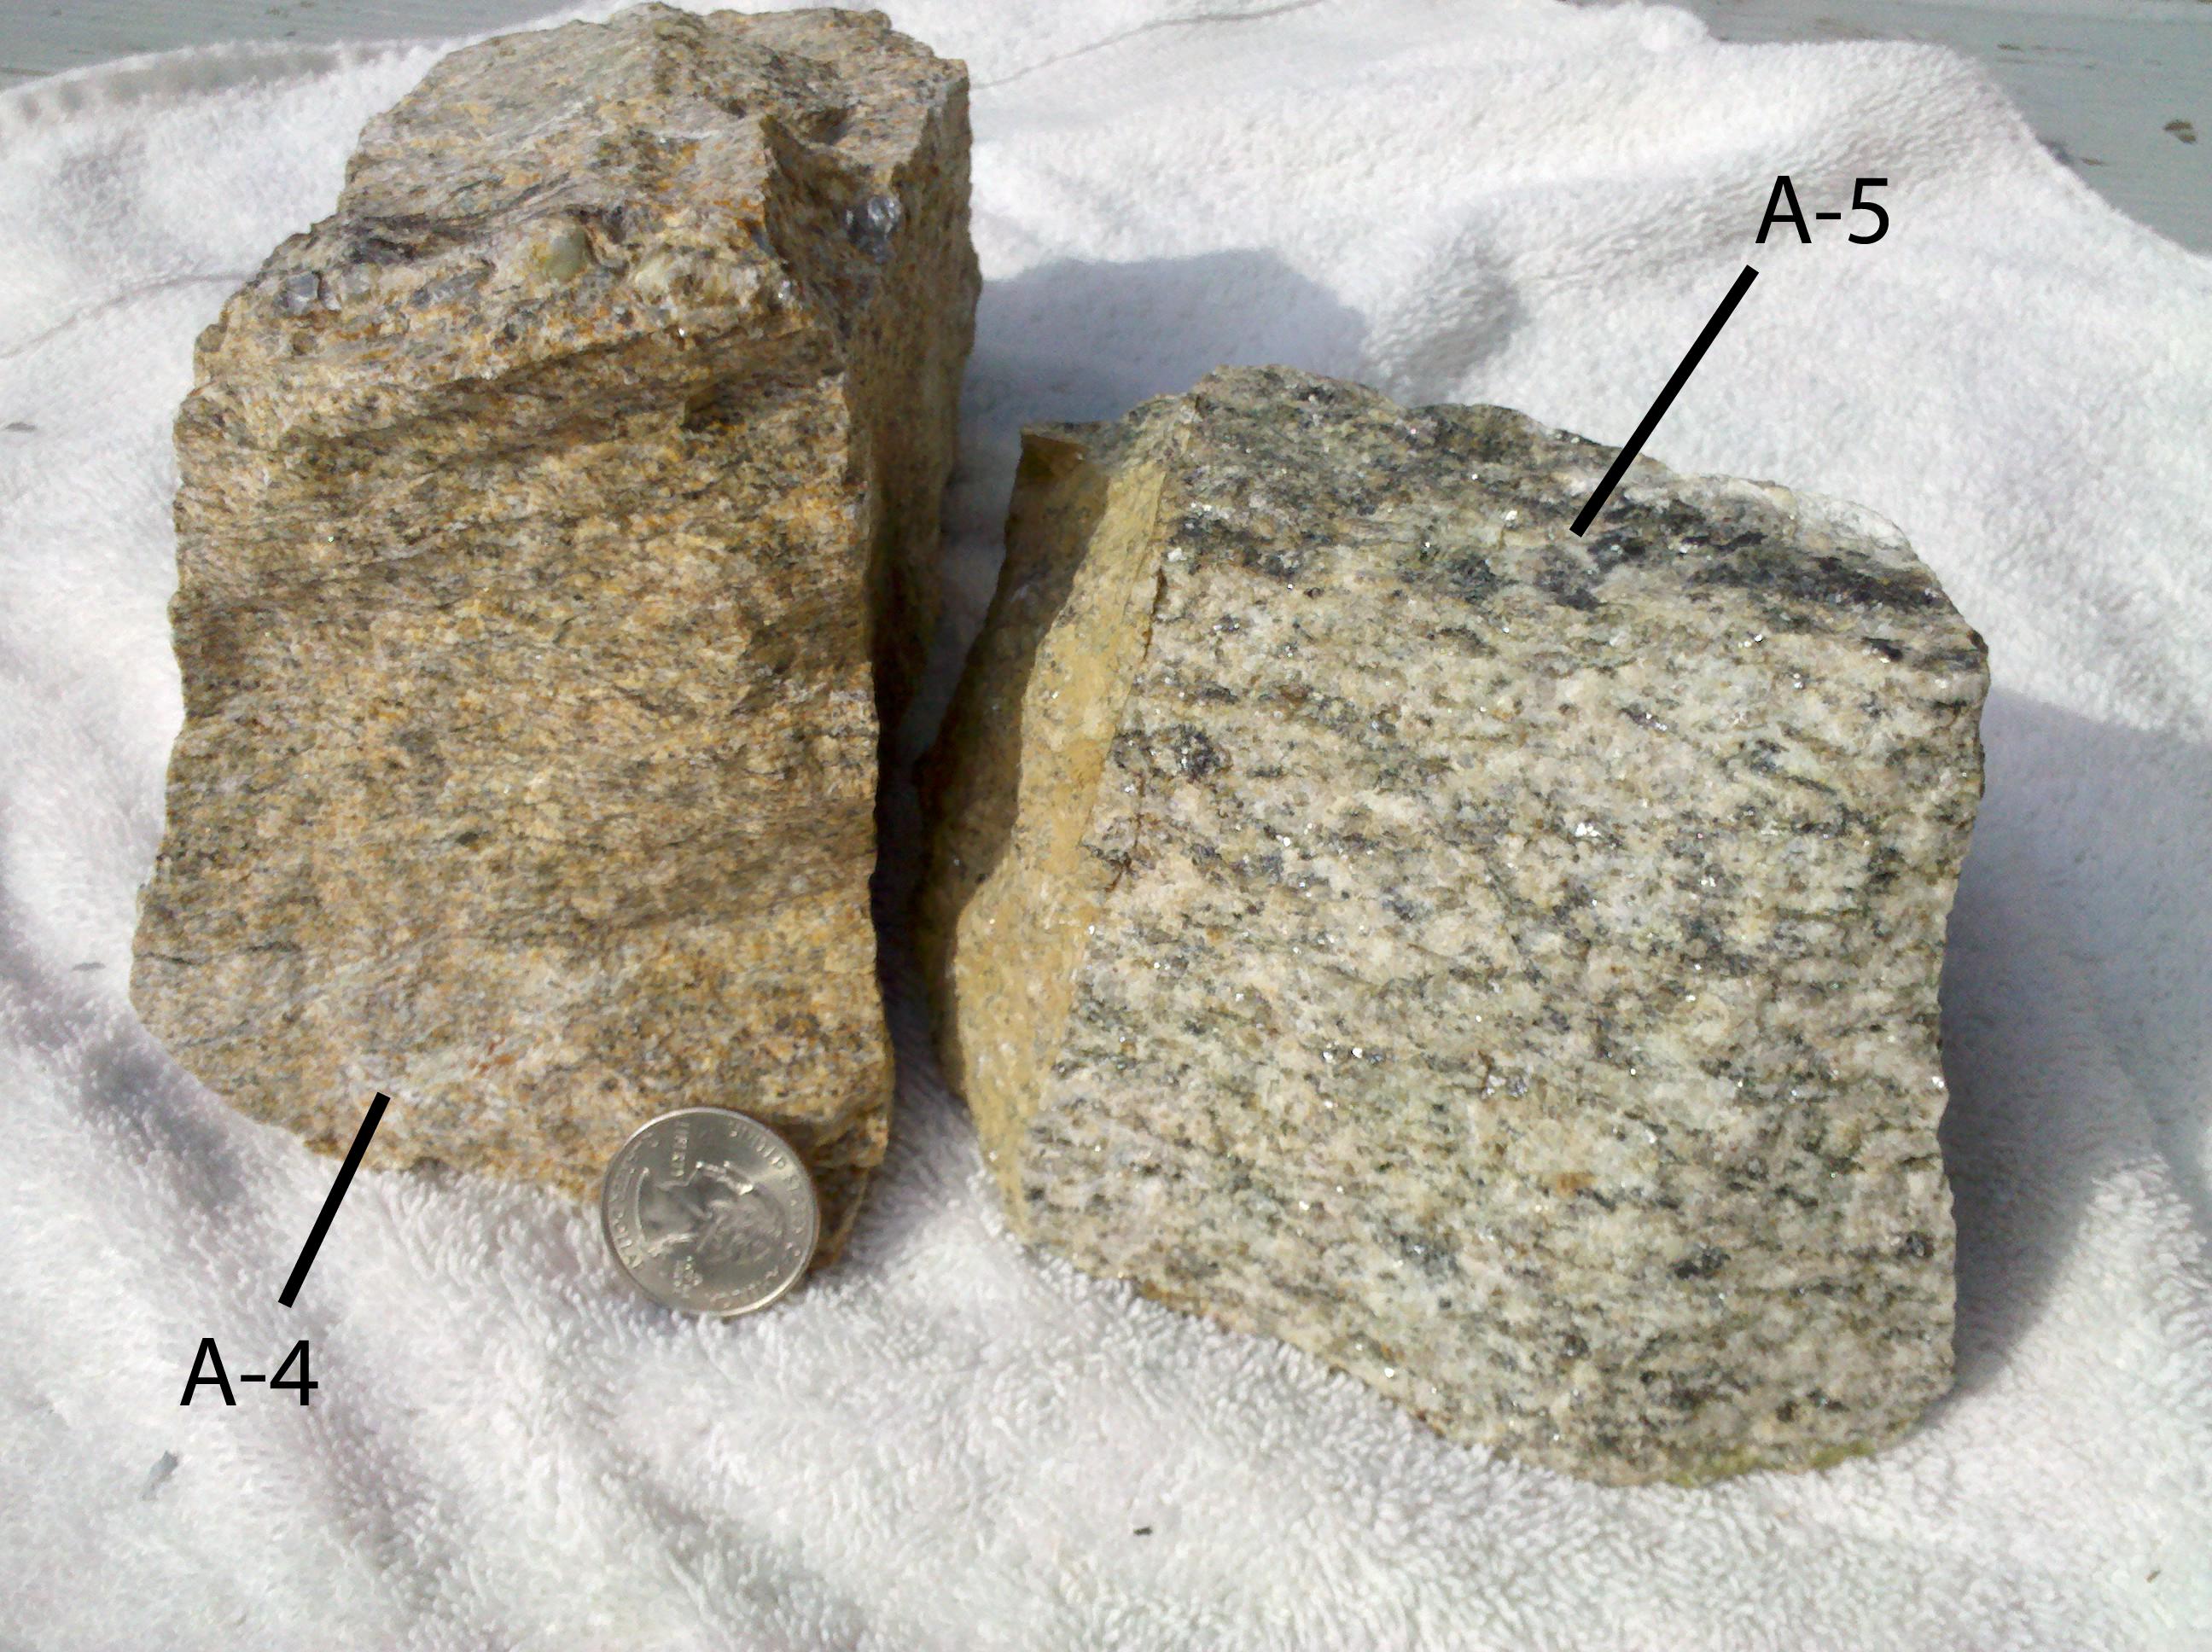 Hand samples of foliated biotite AG